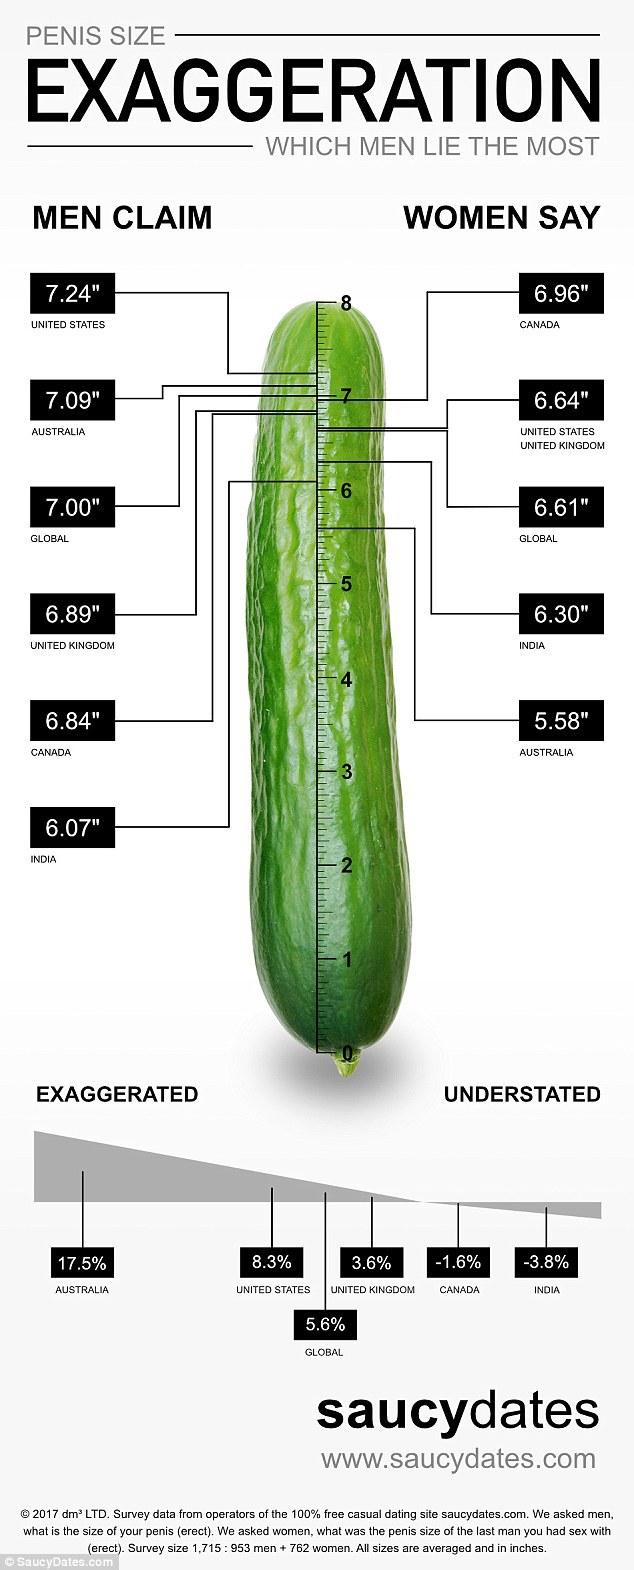 ce dimensiune are penisul masculin